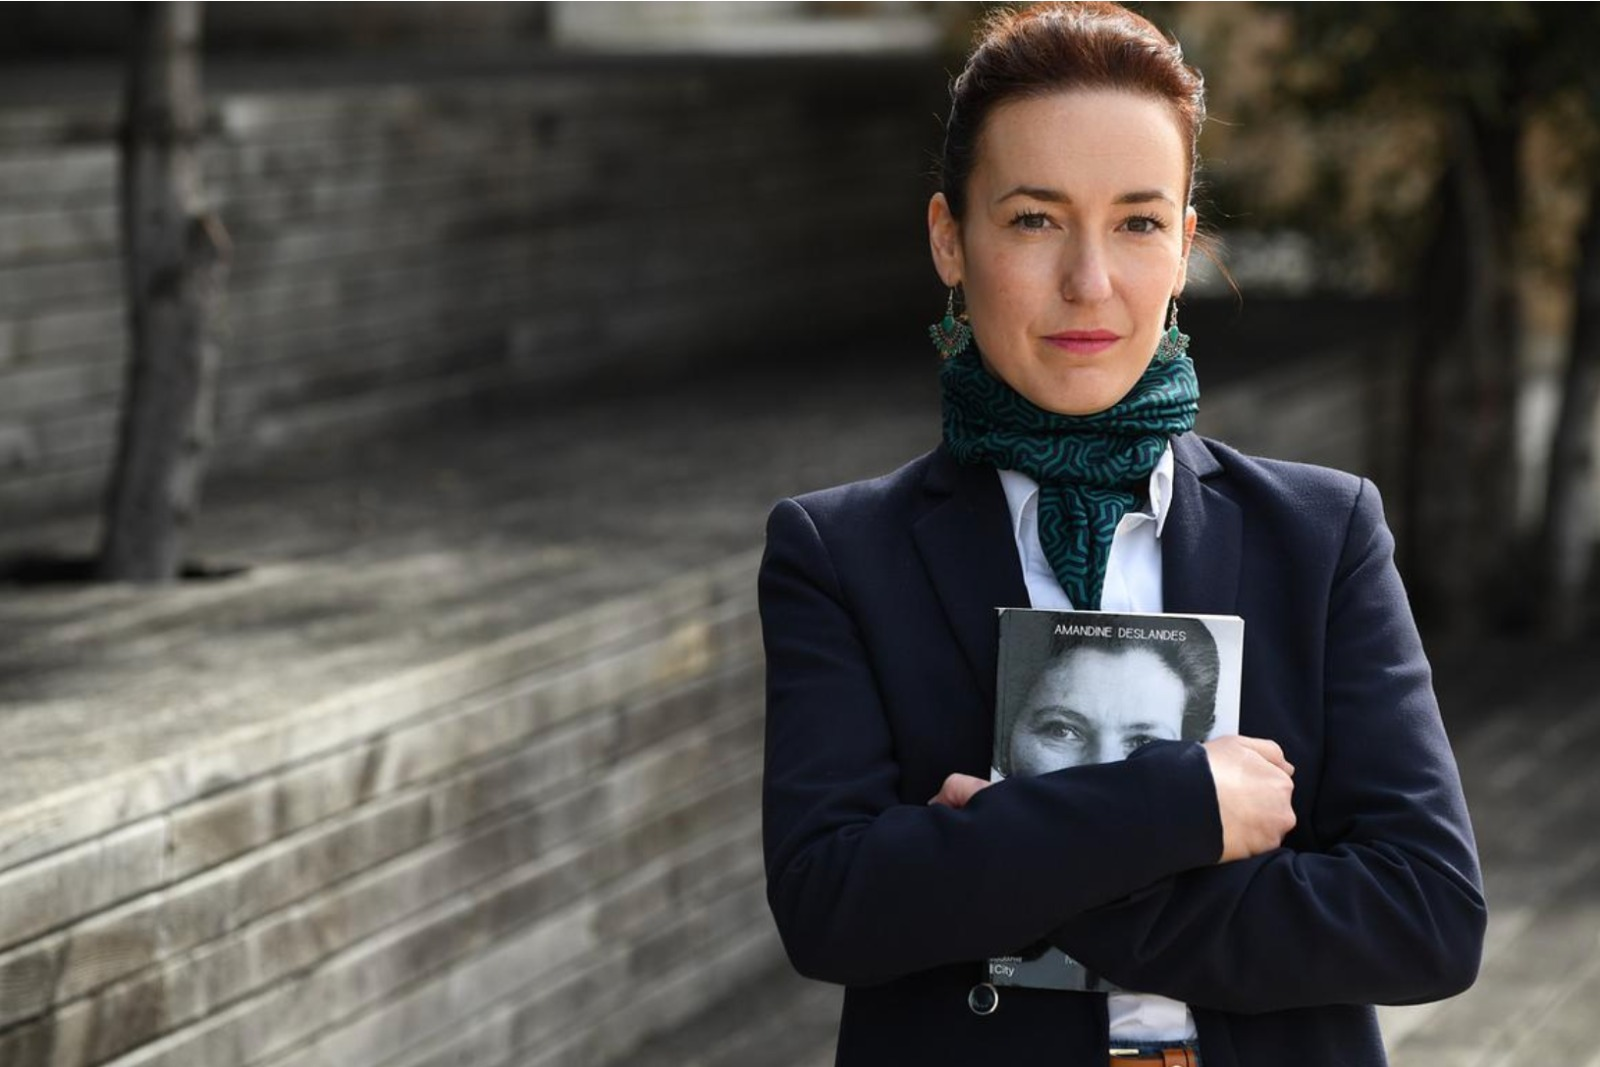 Amandine Deslandes, Simone Veil